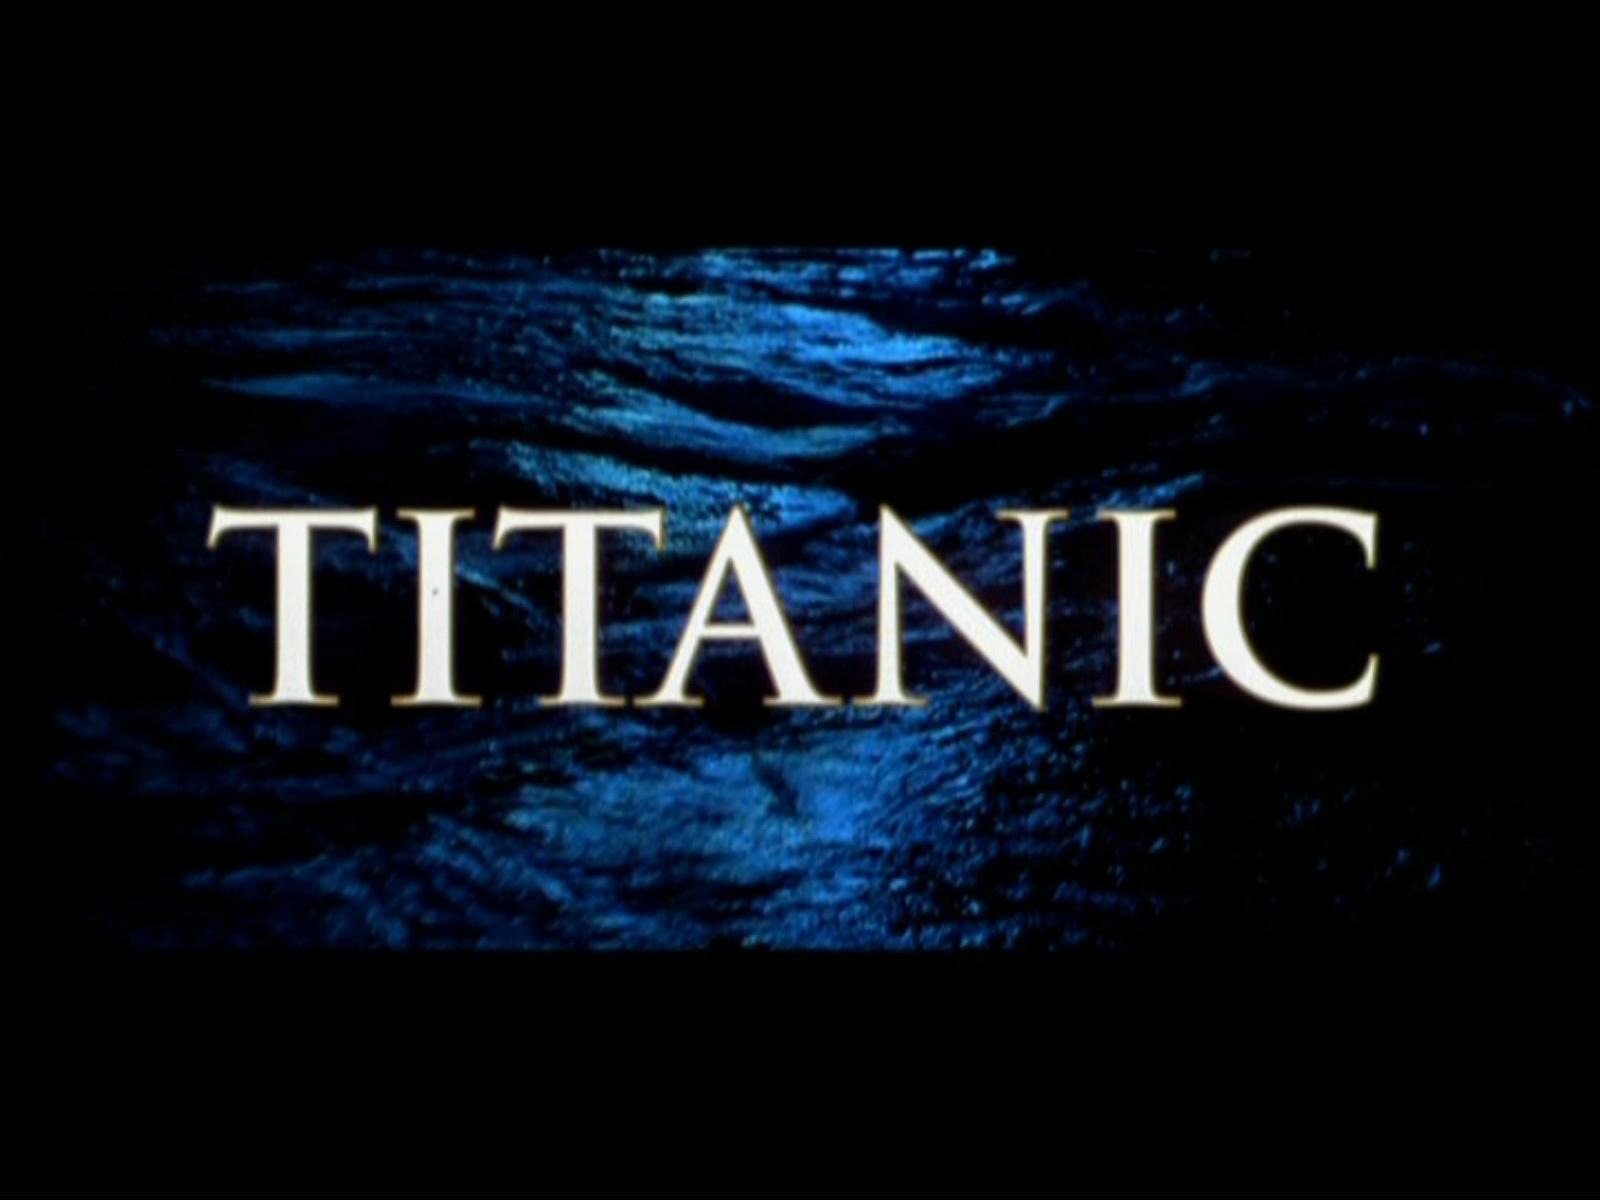 titanic - photo #43